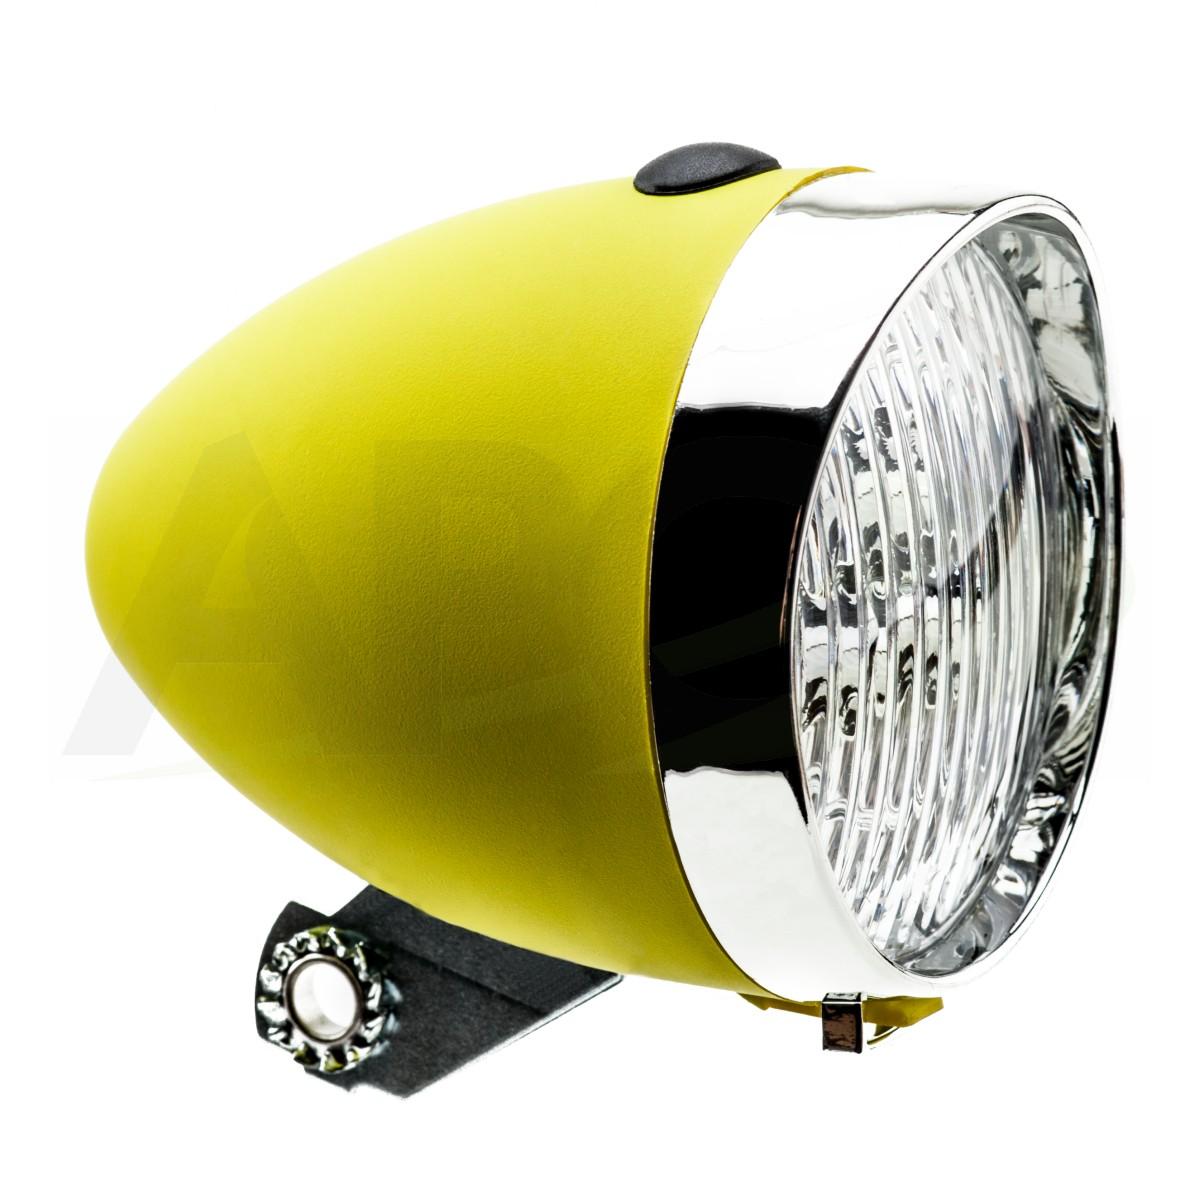 LAMPA BATERYJNA PRZÓD HW 160302 żółta